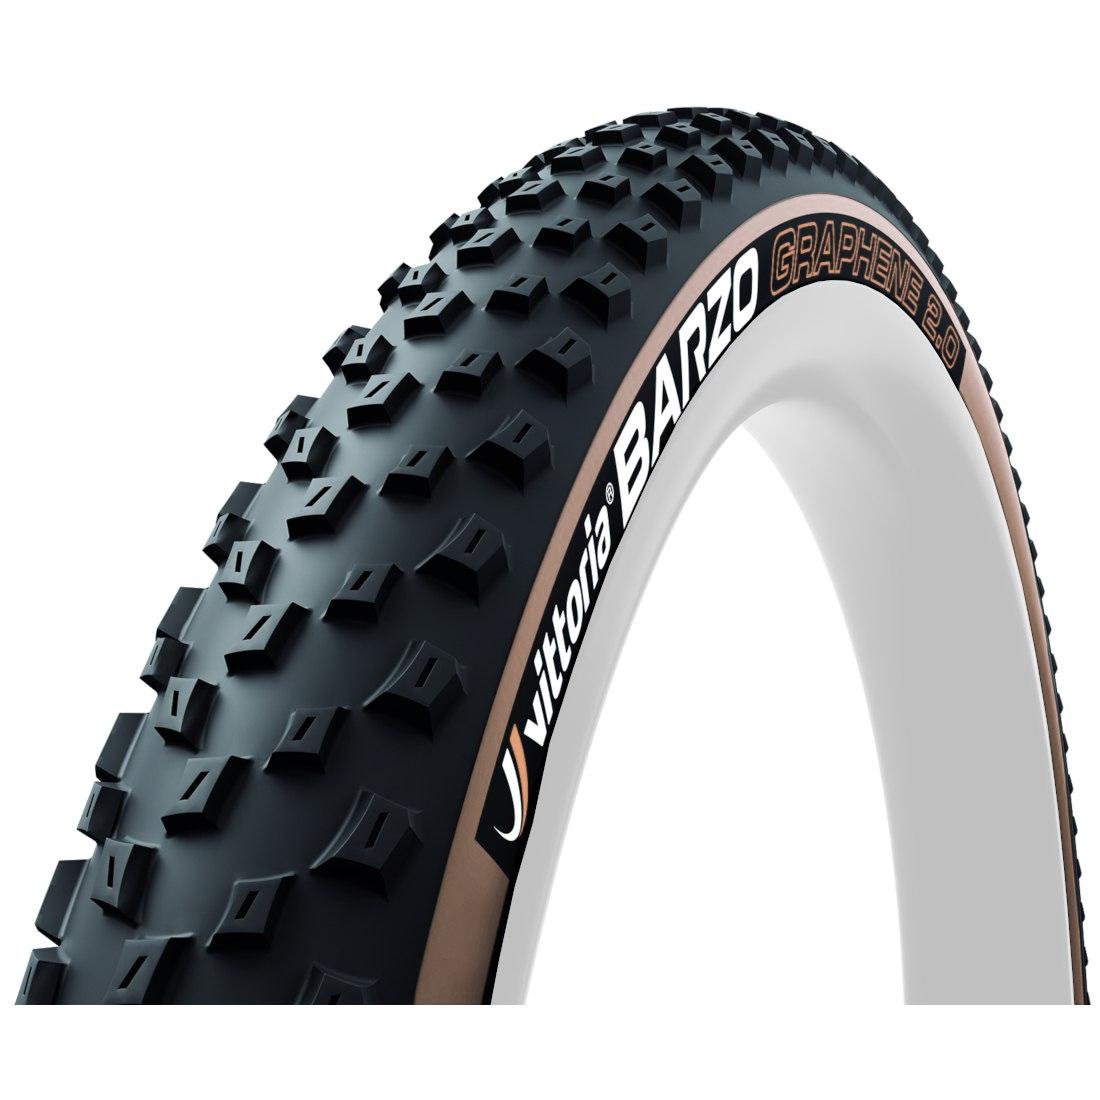 Vittoria Barzo G2.0 TLR 29 Inch MTB Folding Tire - black / tan - ETRTO 55-622